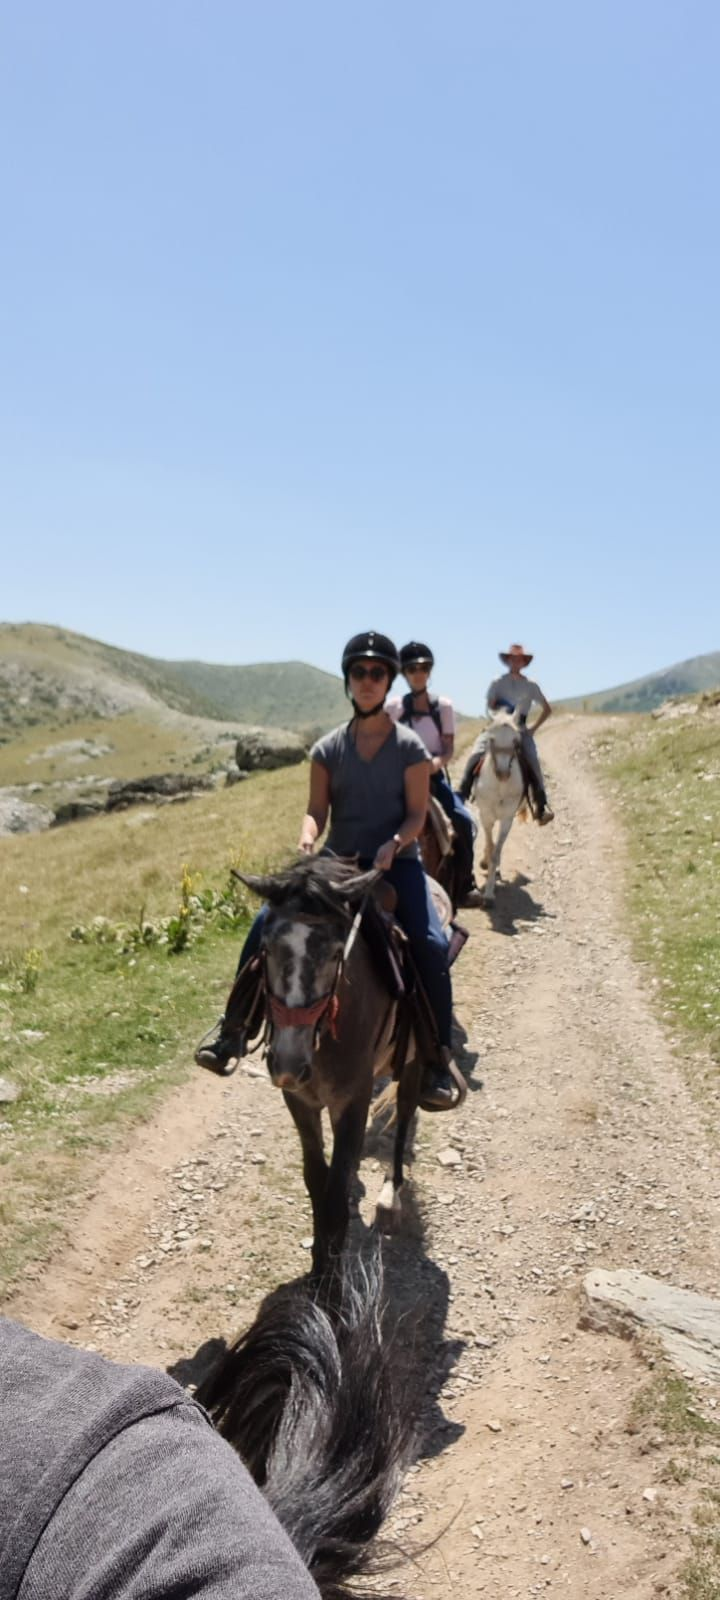 Samedi 31 juillet : balade à cheval + églises